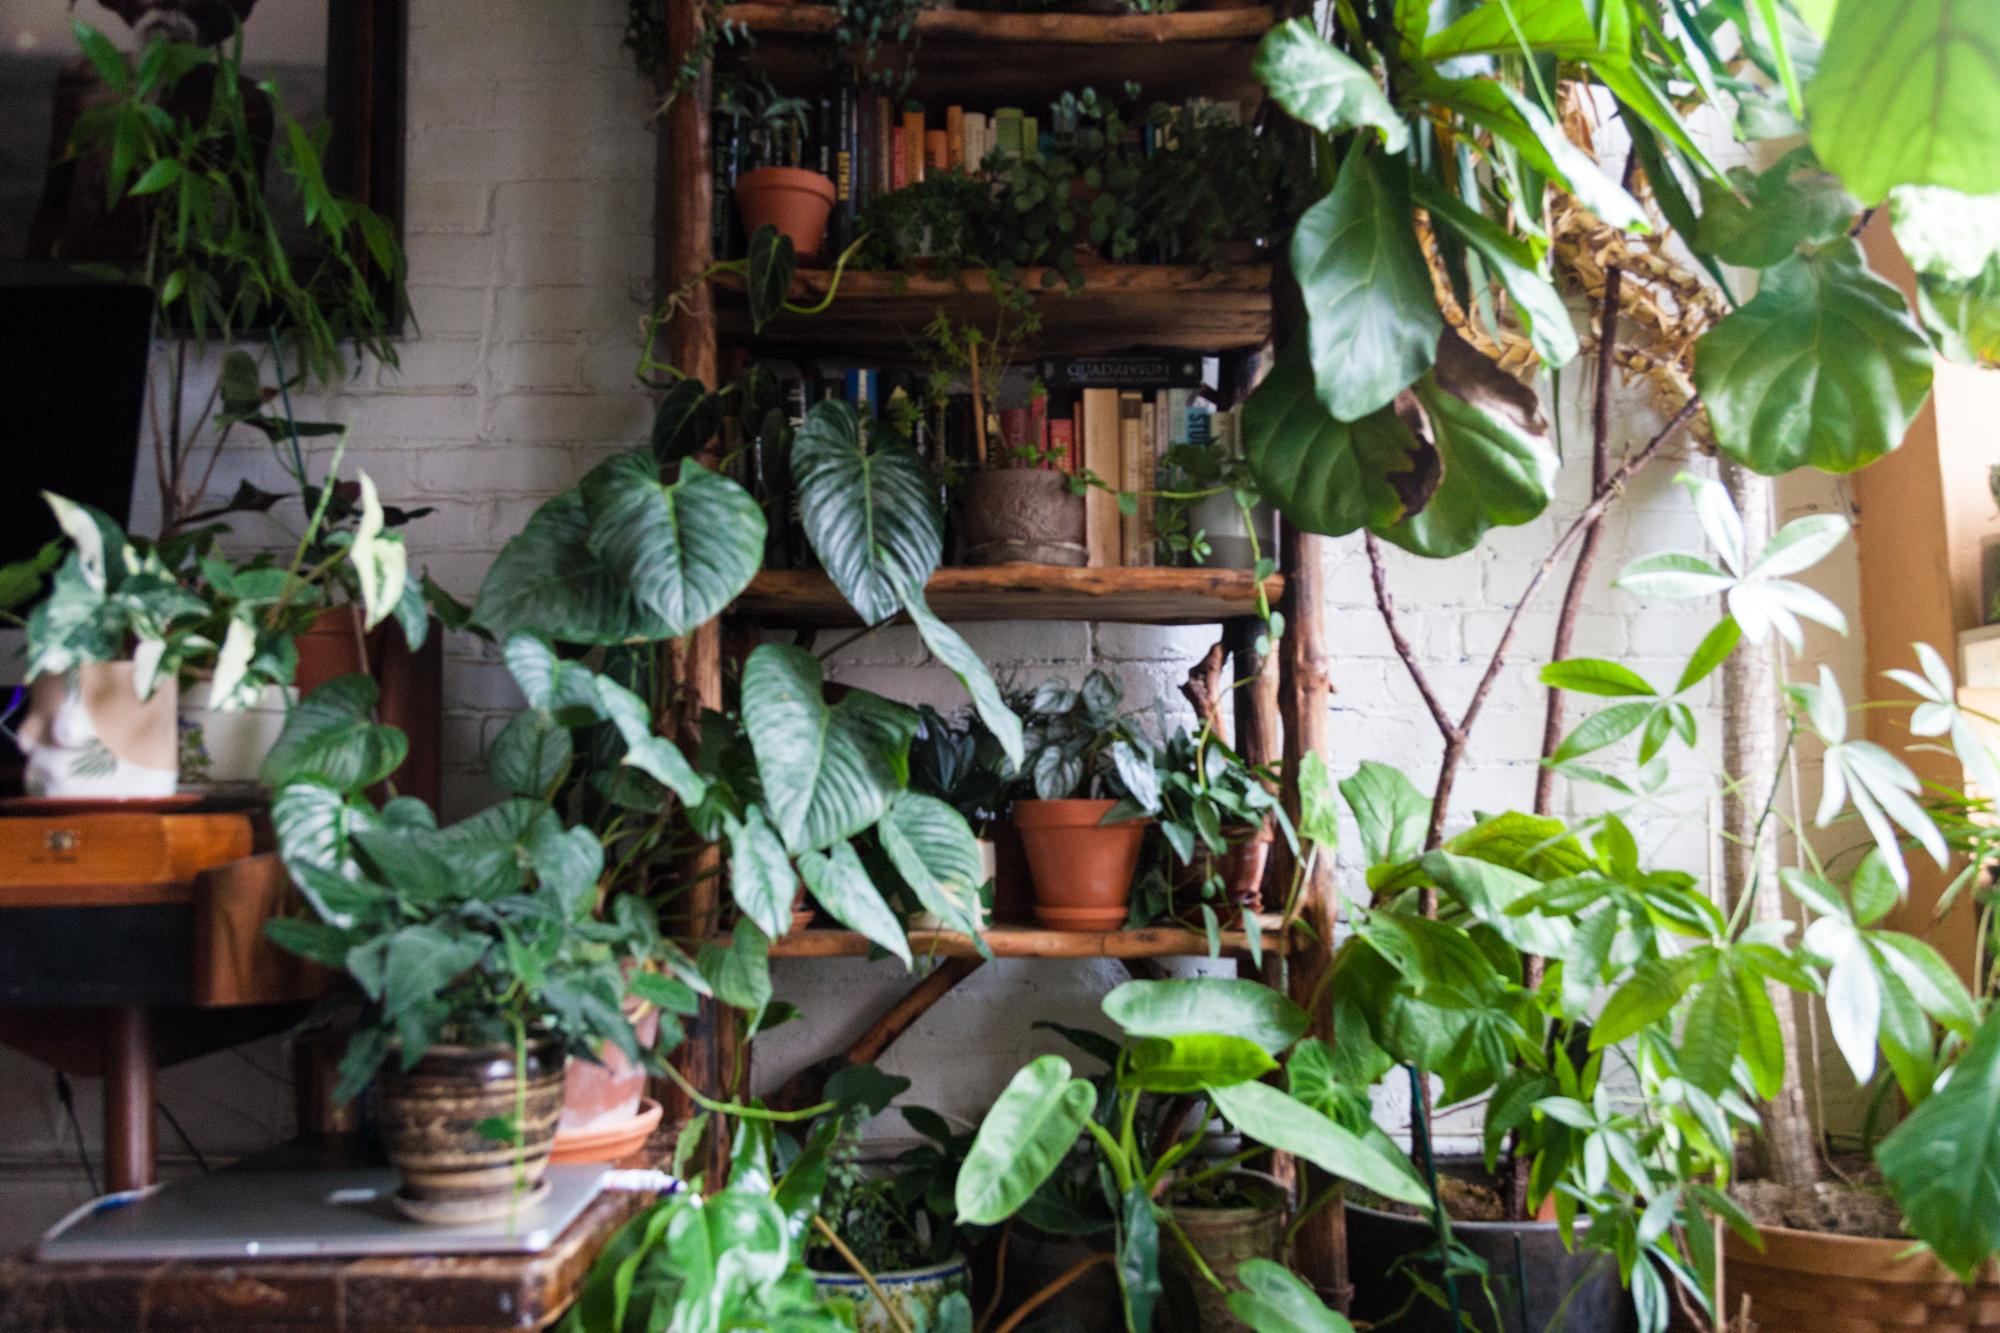 Fertilizing Houseplants 101